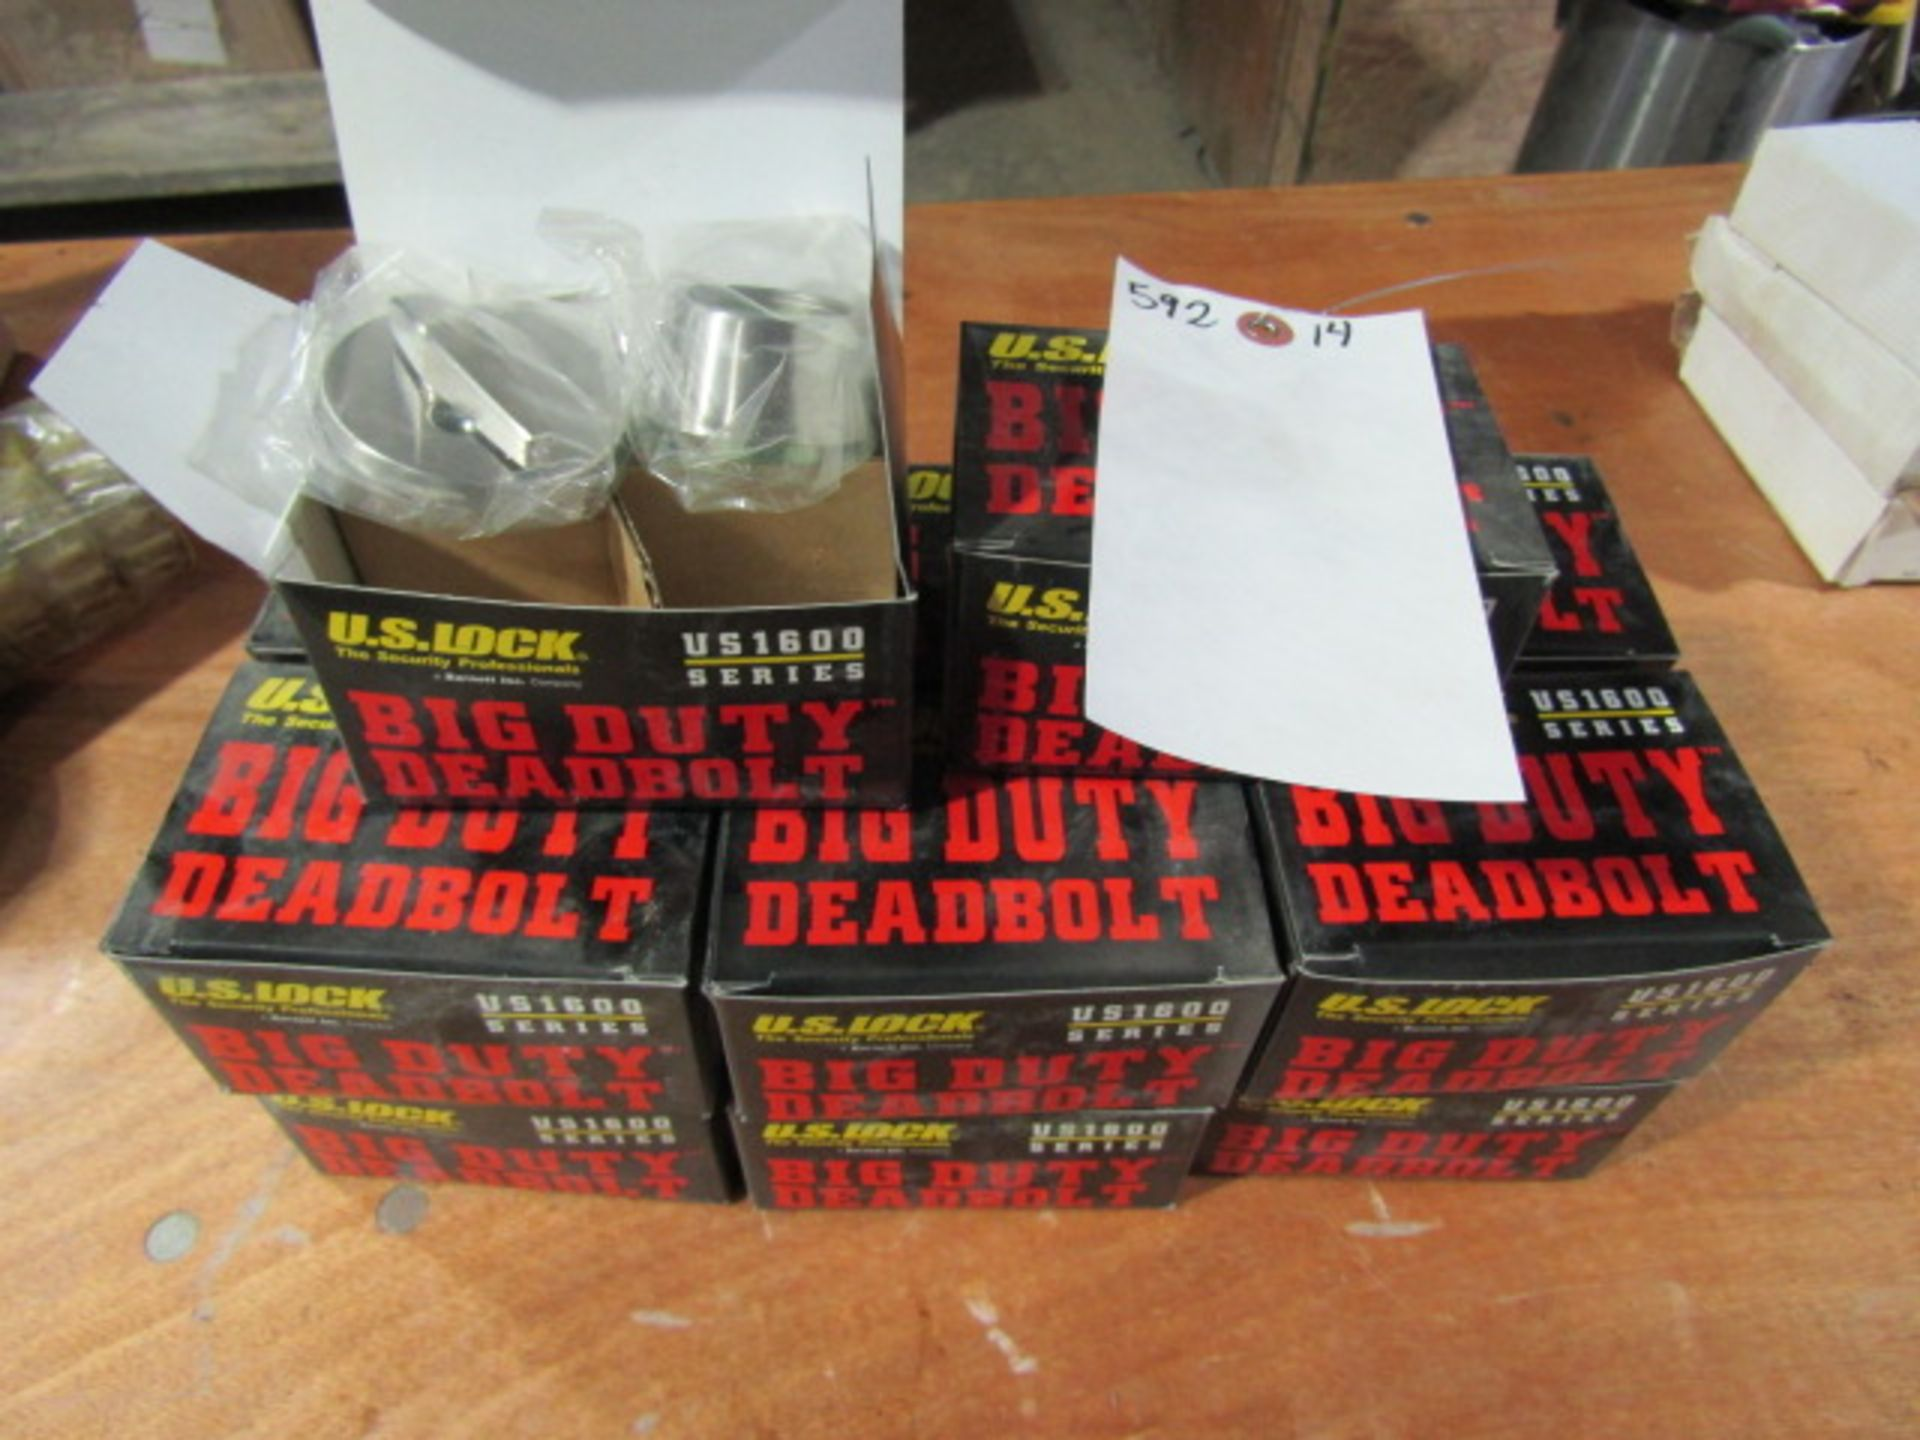 Lot 312 - (14) New Big Duty Deadbolt, Located in Winterset, IA